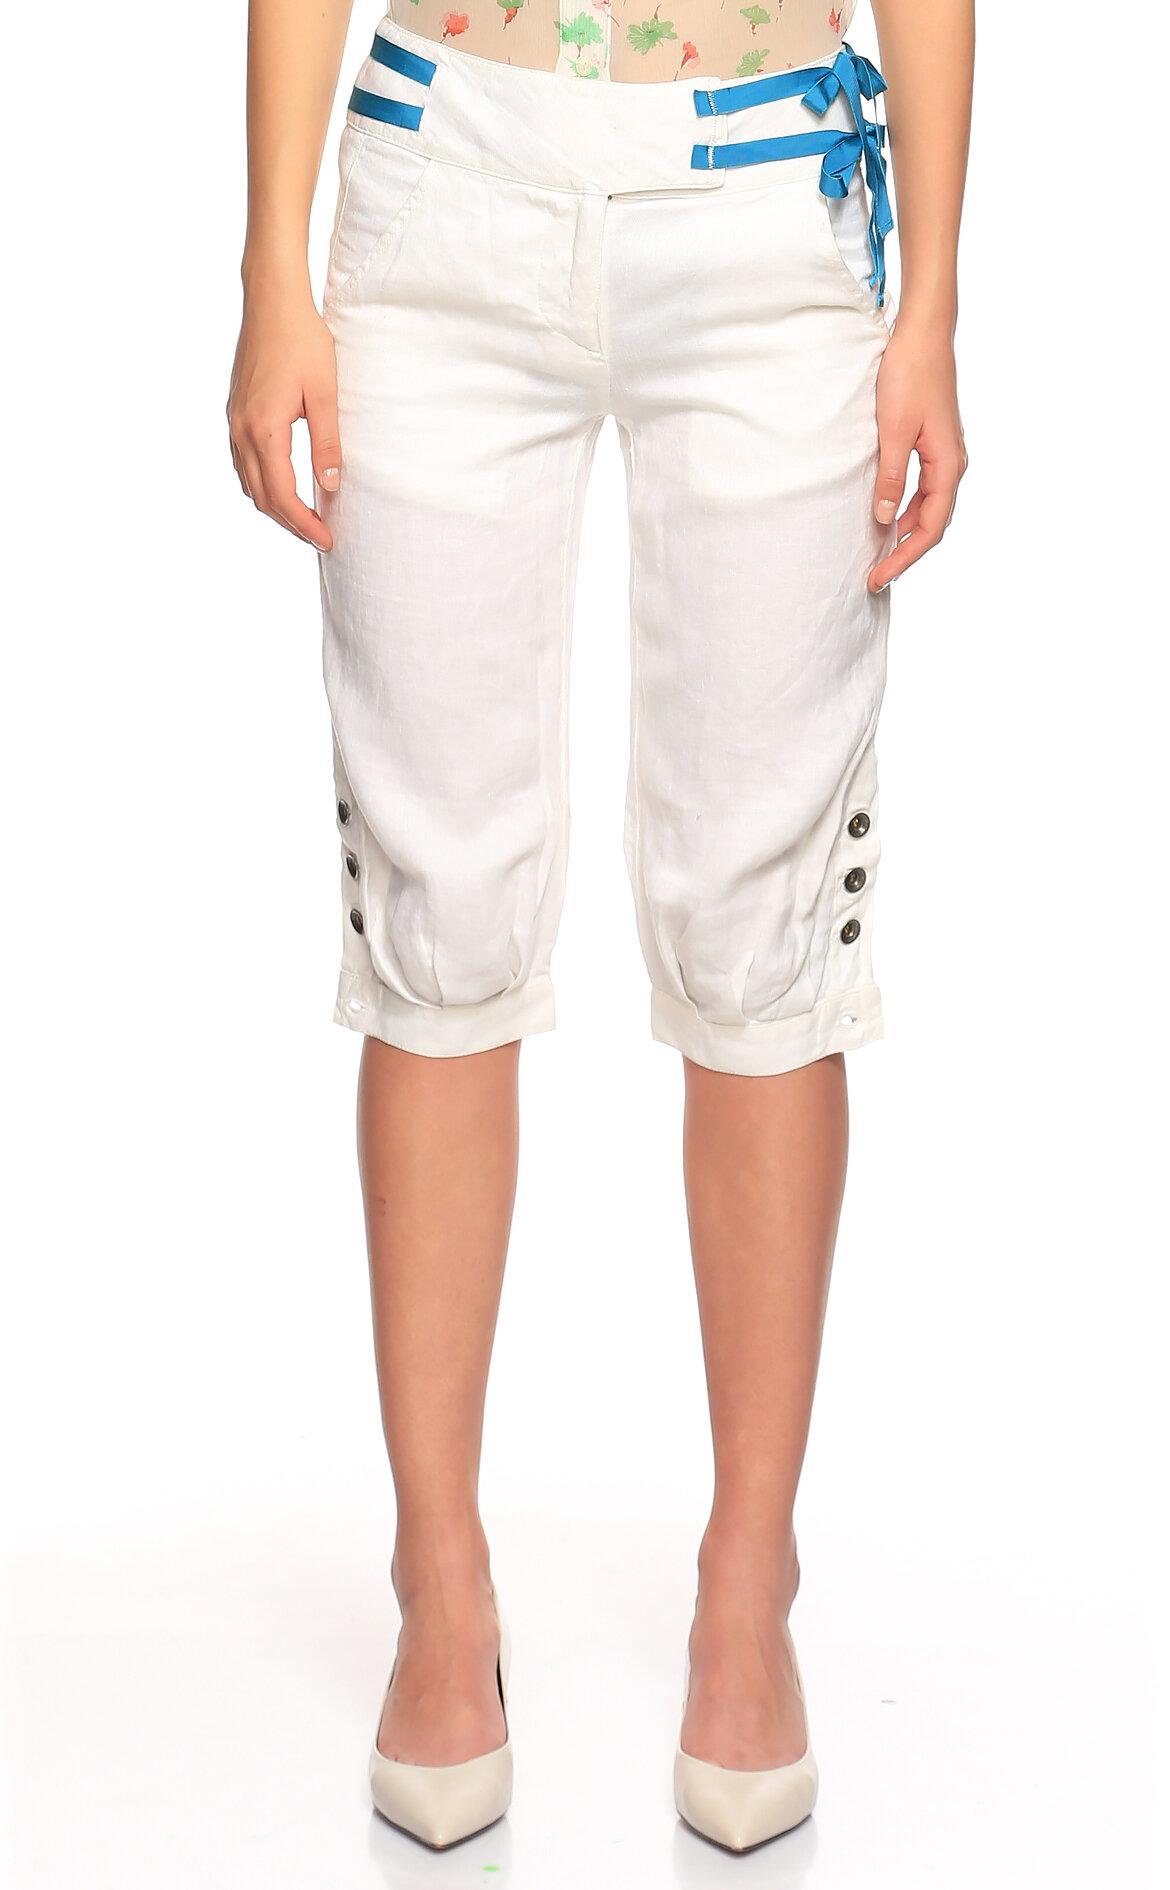 Fornarina Jeans-Fornarina Jeans Keten Beyaz Bermuda